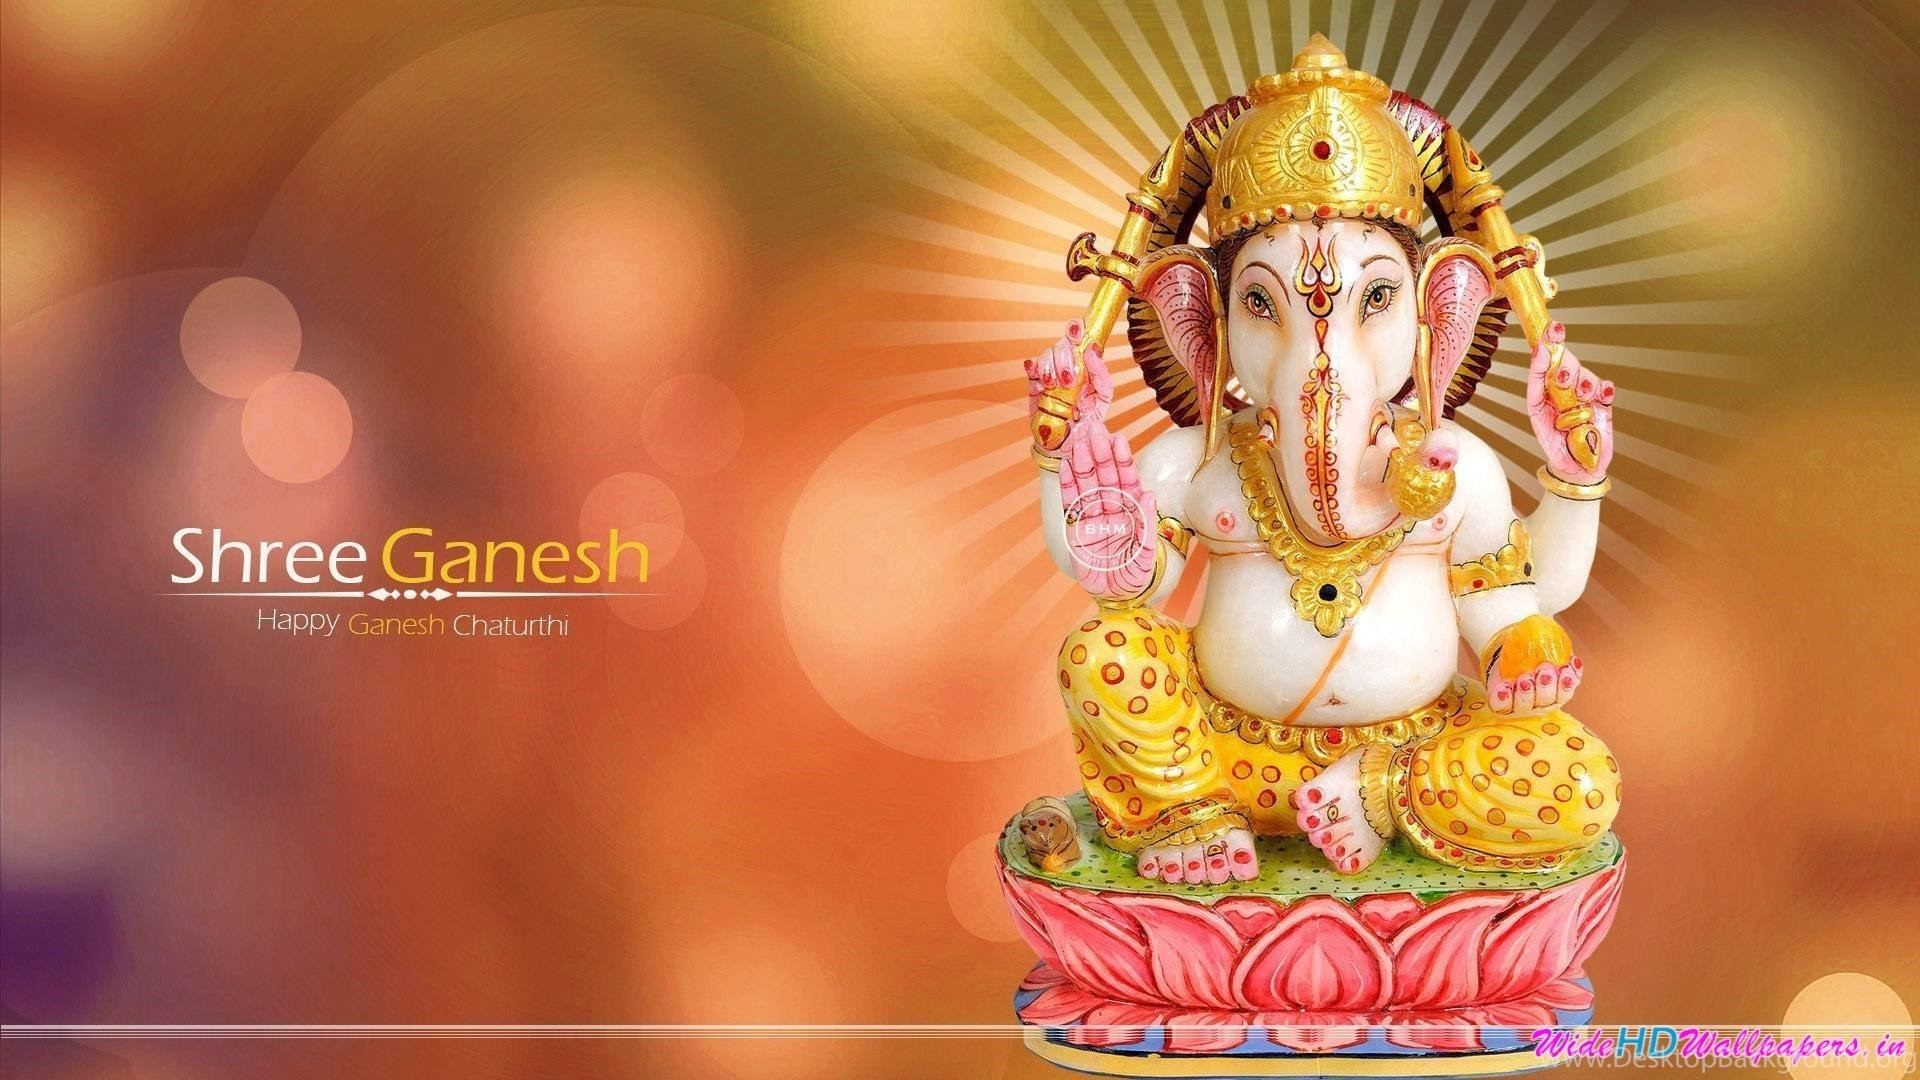 Ganpati Hd Wallpapers 1920x1080: Ganesh Background (50+ Images